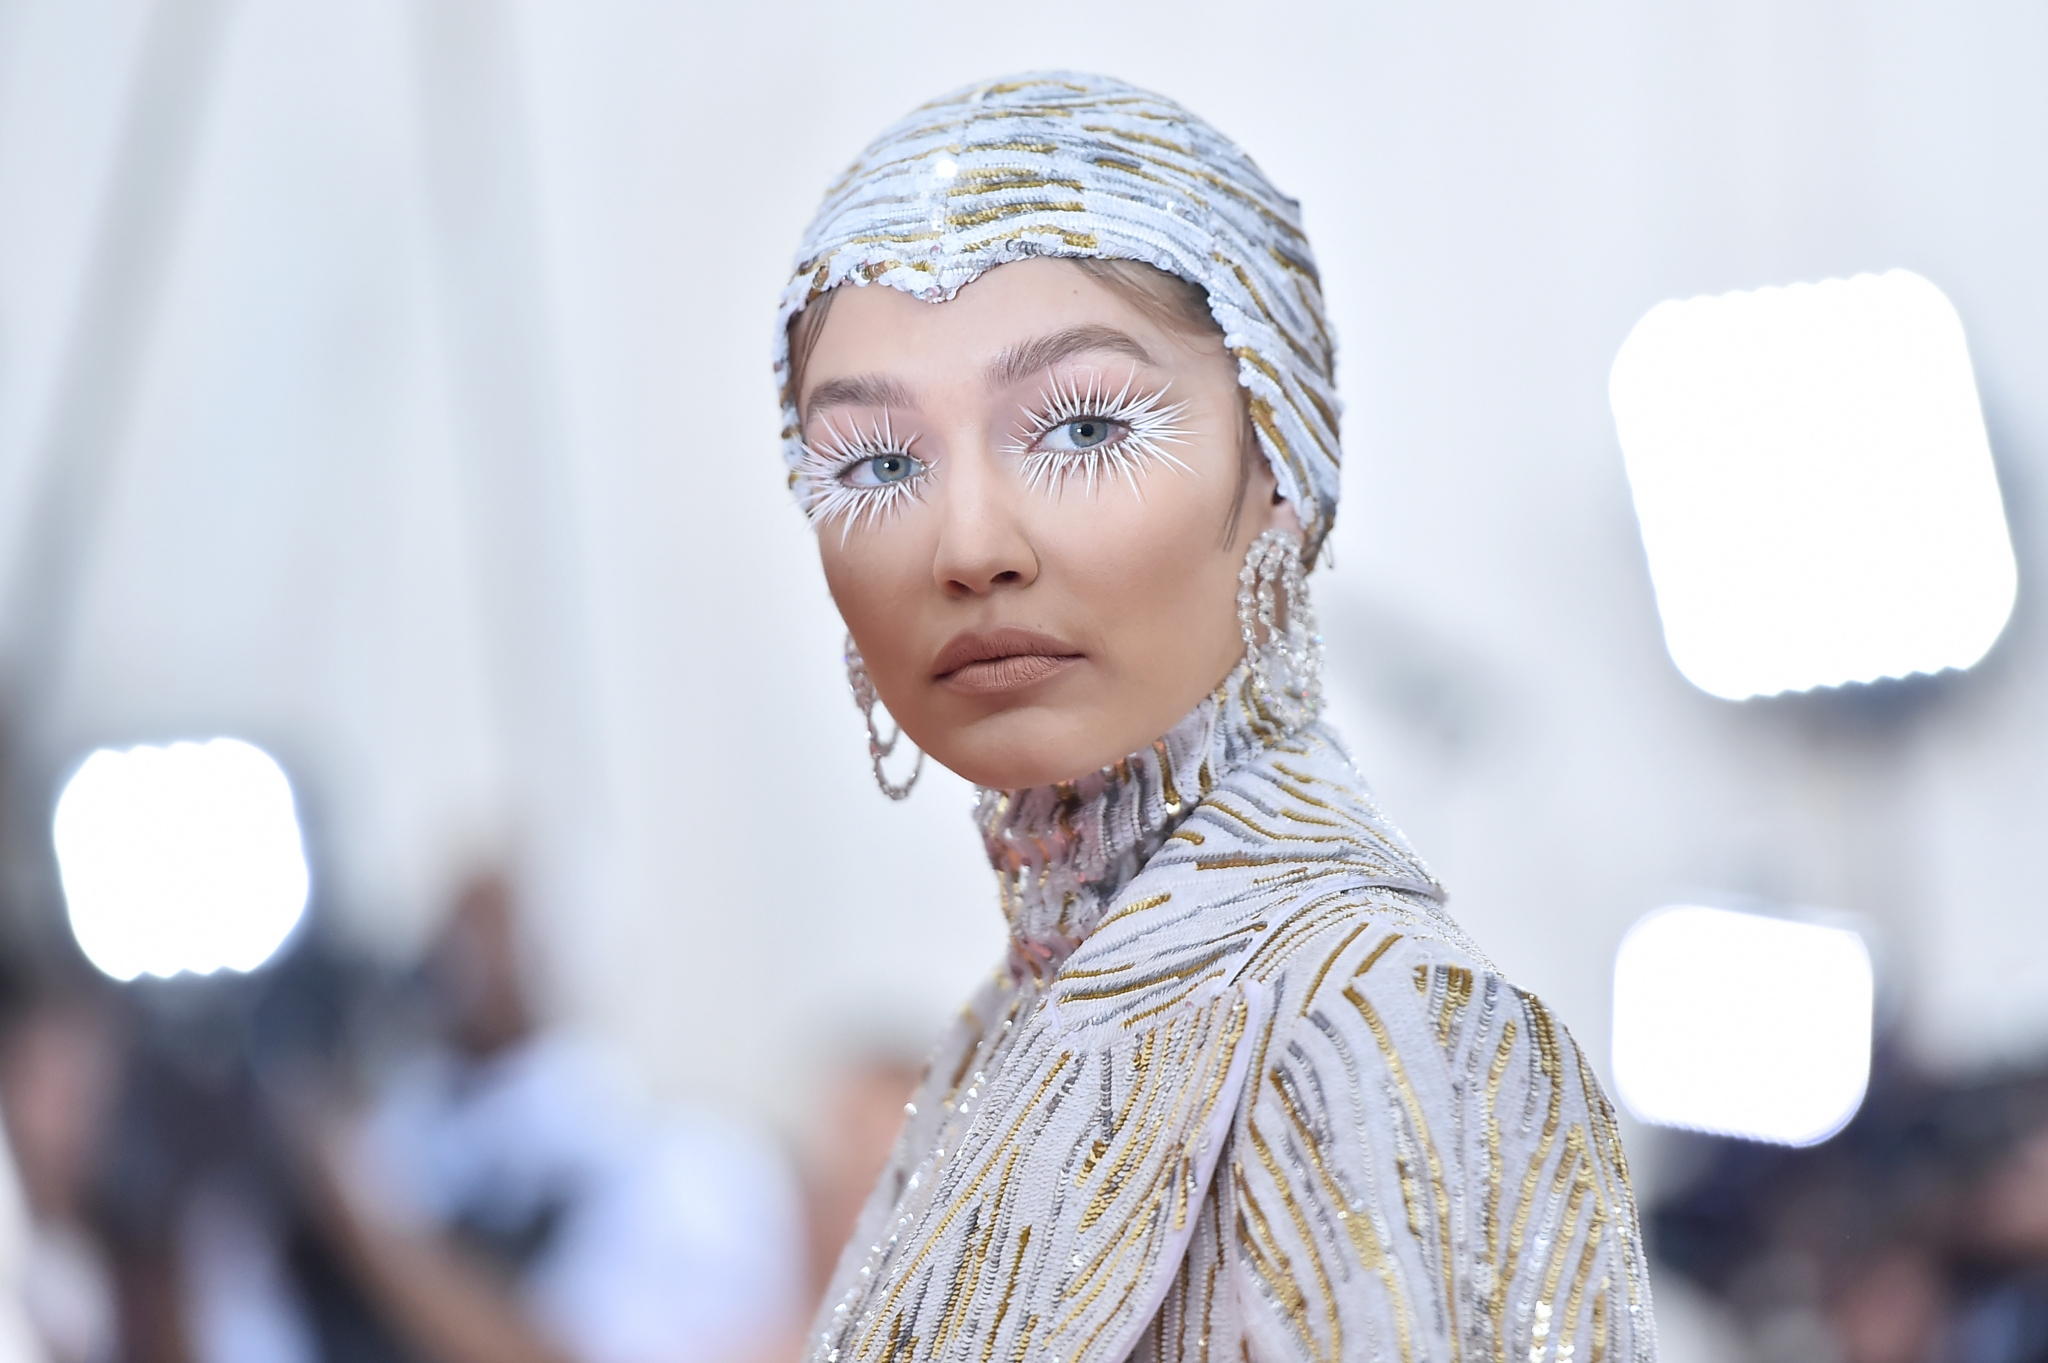 gigi-hadid-met-gala-2019-beauty.jpg